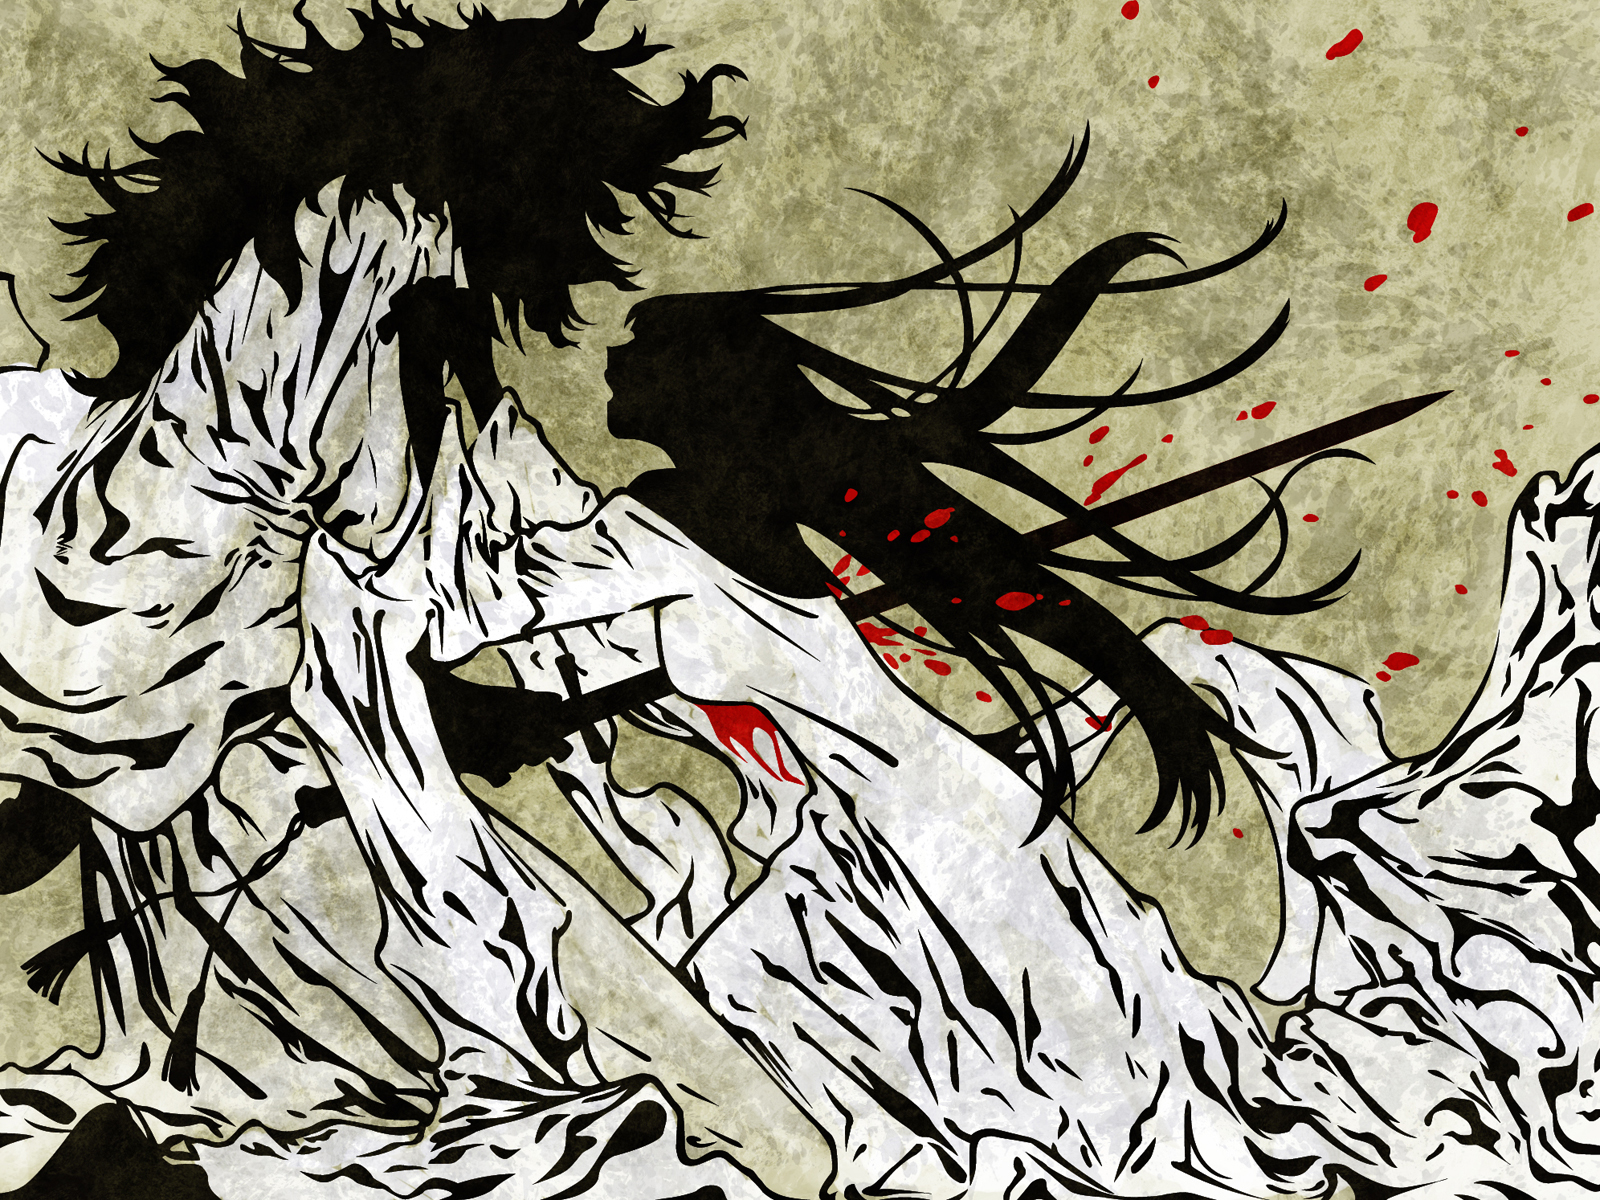 Shin Angyo Onshi by bokkolah